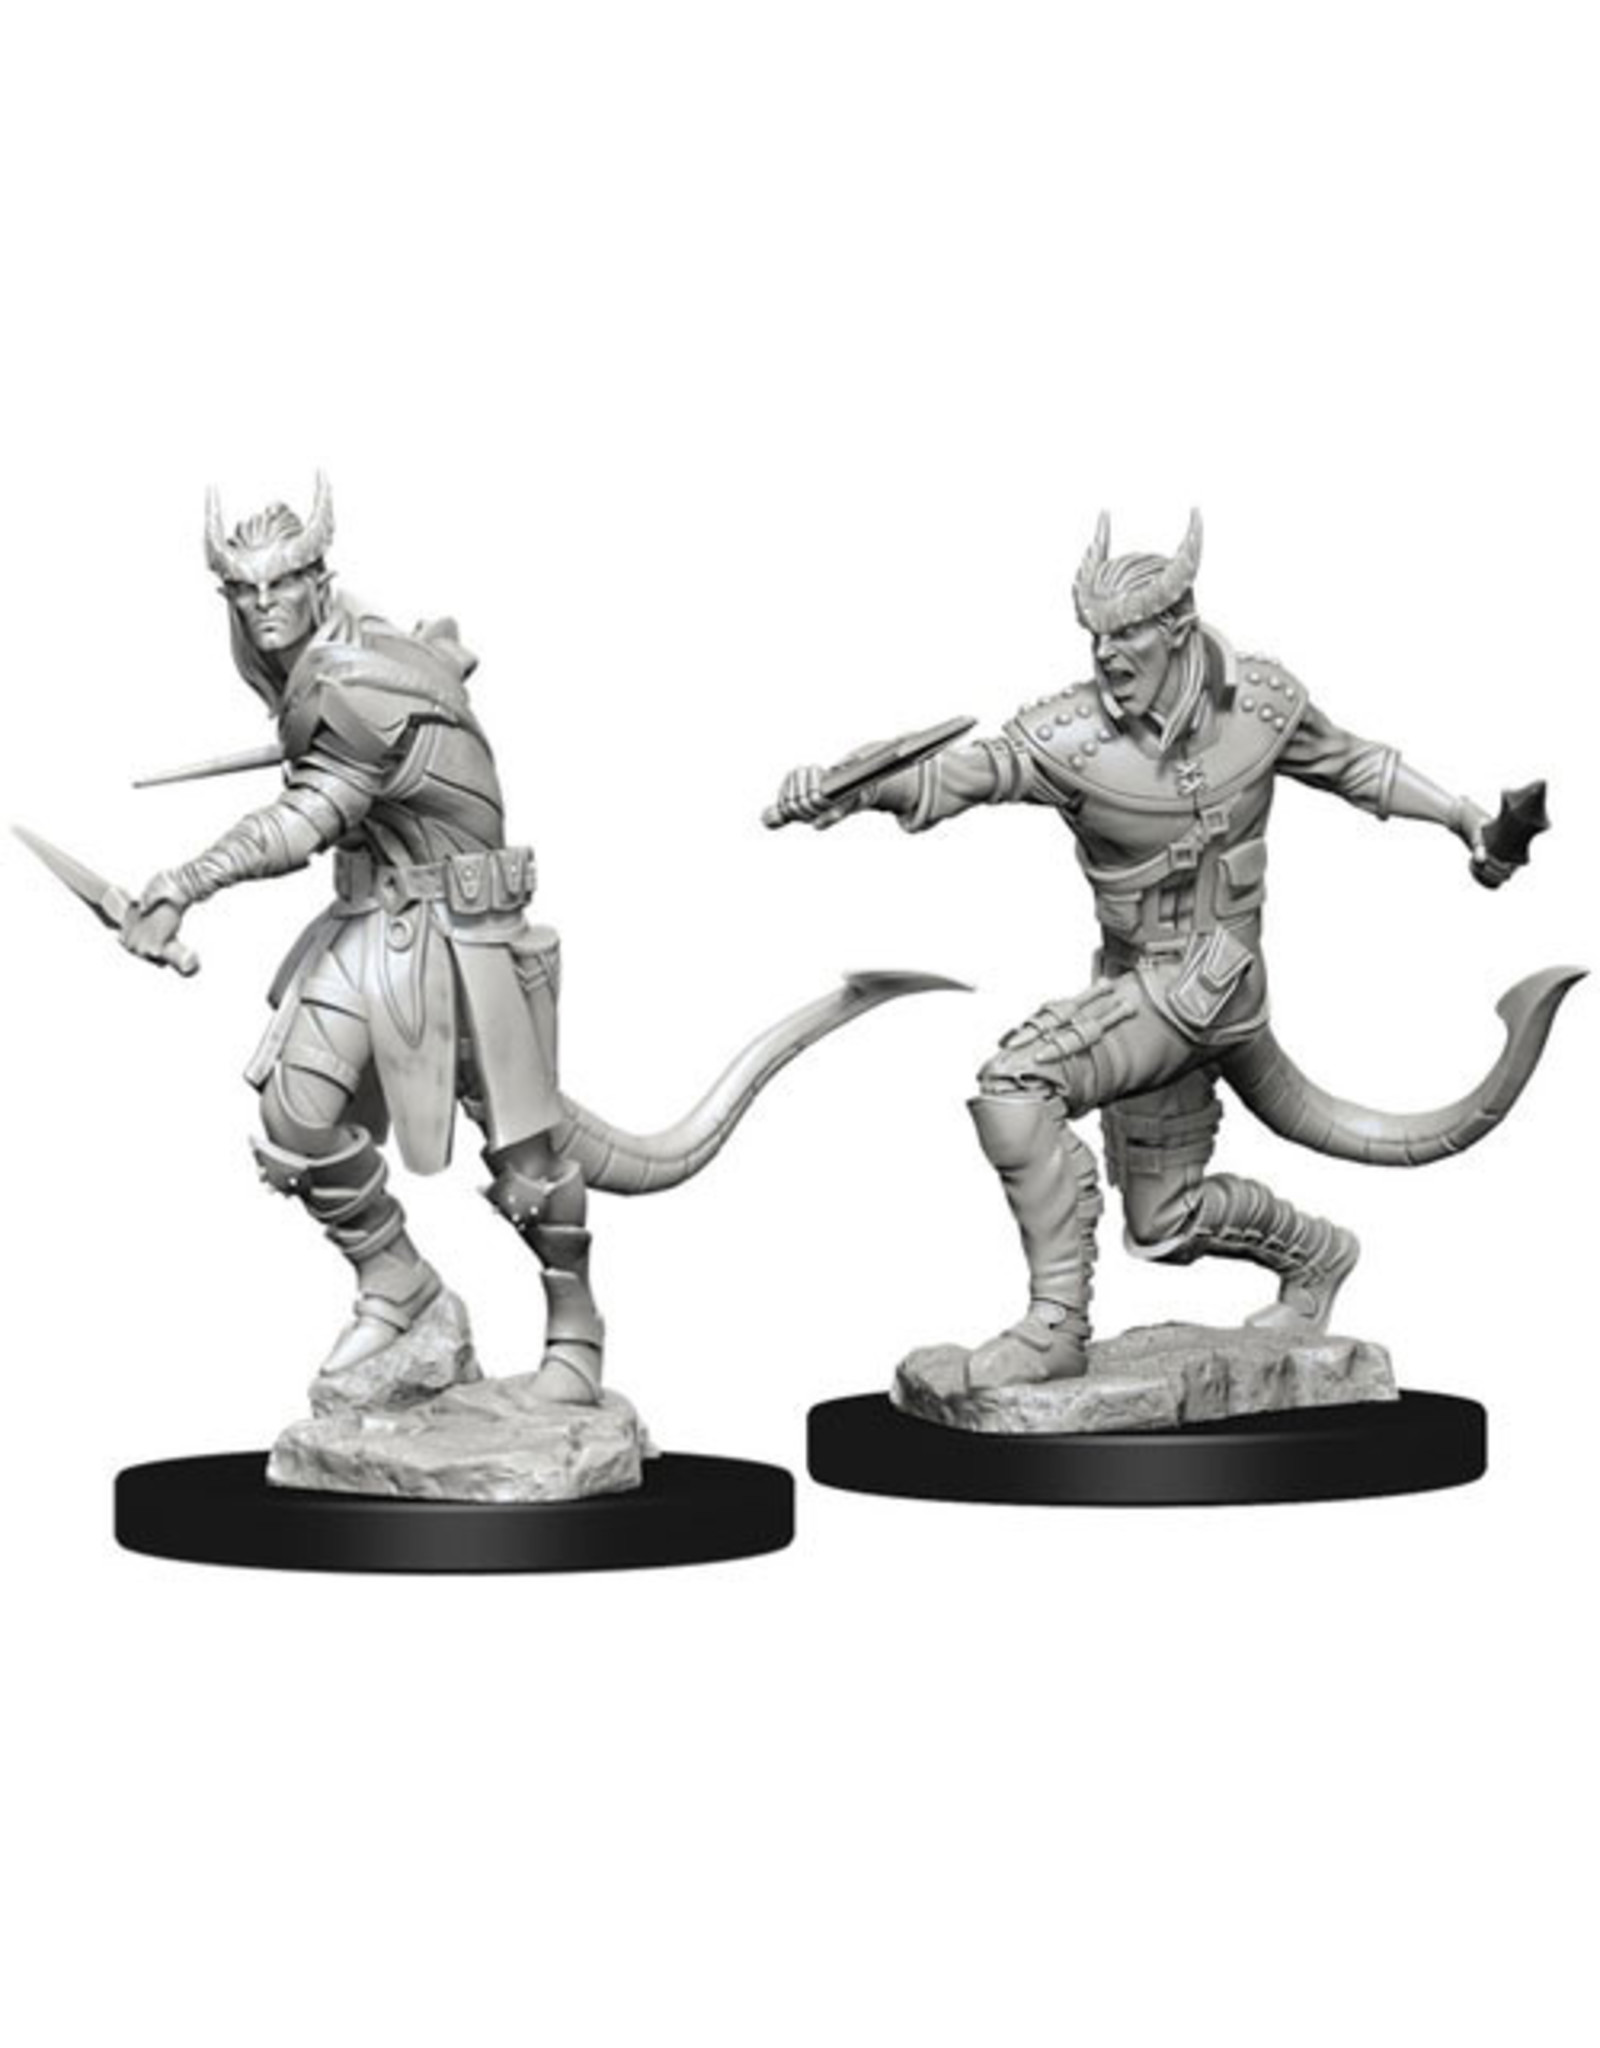 Dungeons & Dragons D&D NMU Tiefling Male Rogue